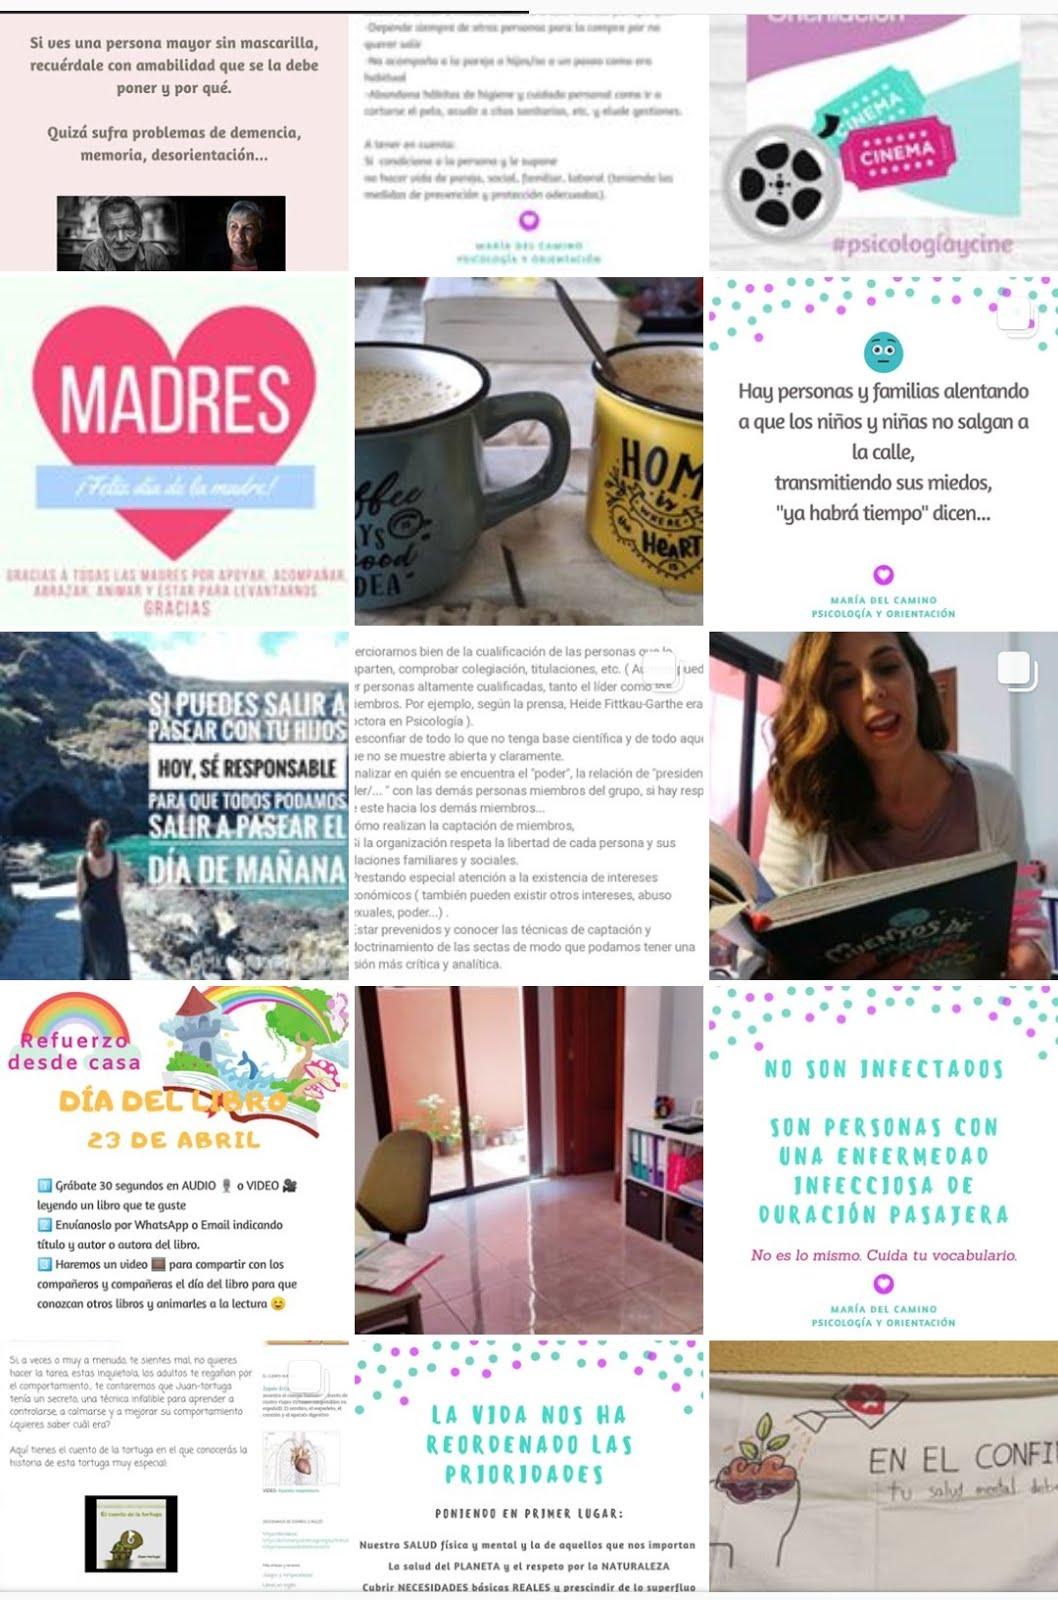 Instagram @psicologiaorientacion